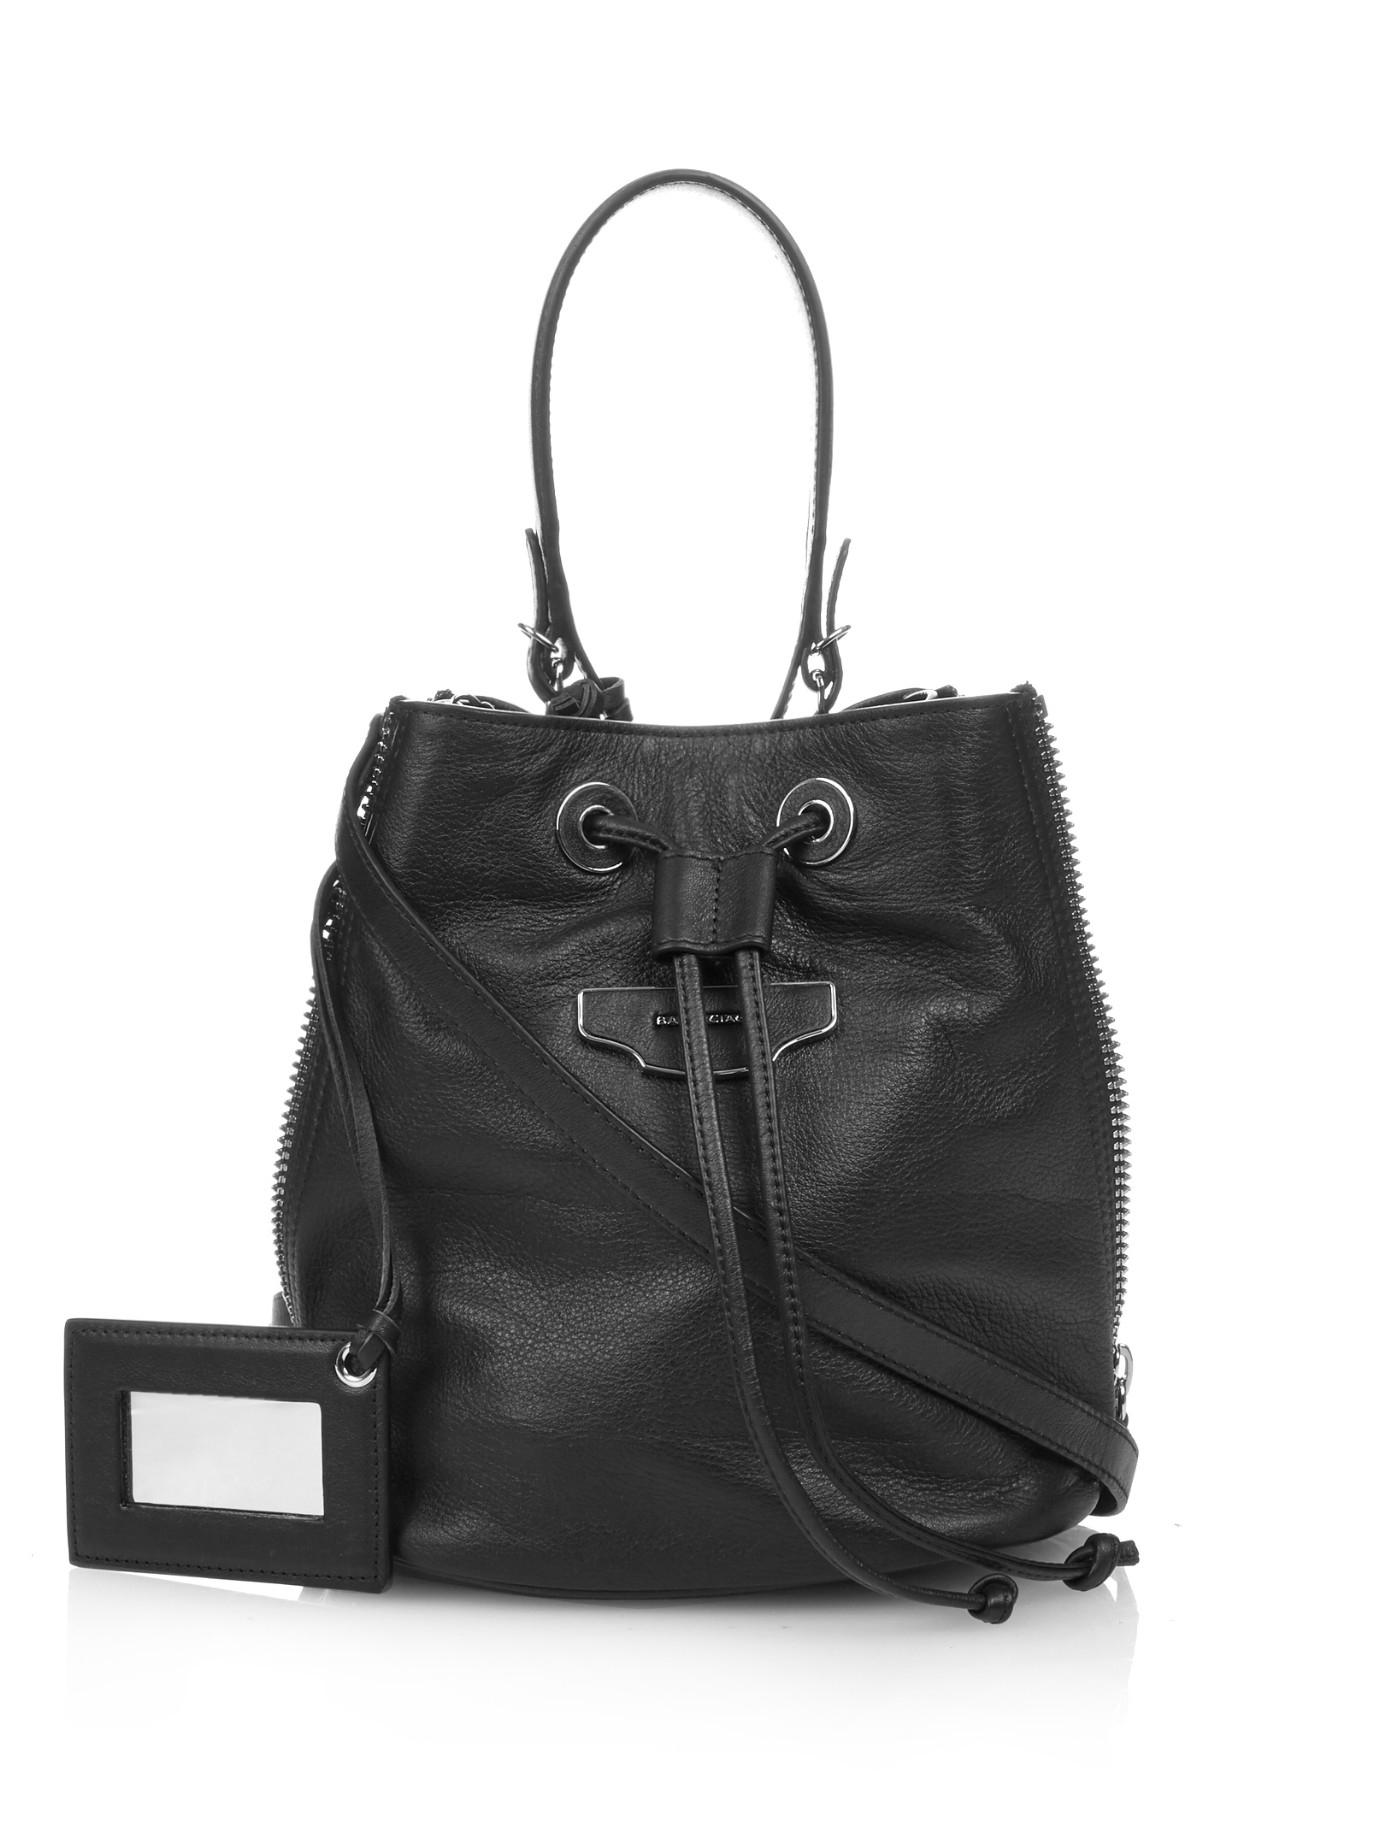 Lyst - Balenciaga Papier Plate Leather Cross-body Bucket Bag in Black bb8549118d147